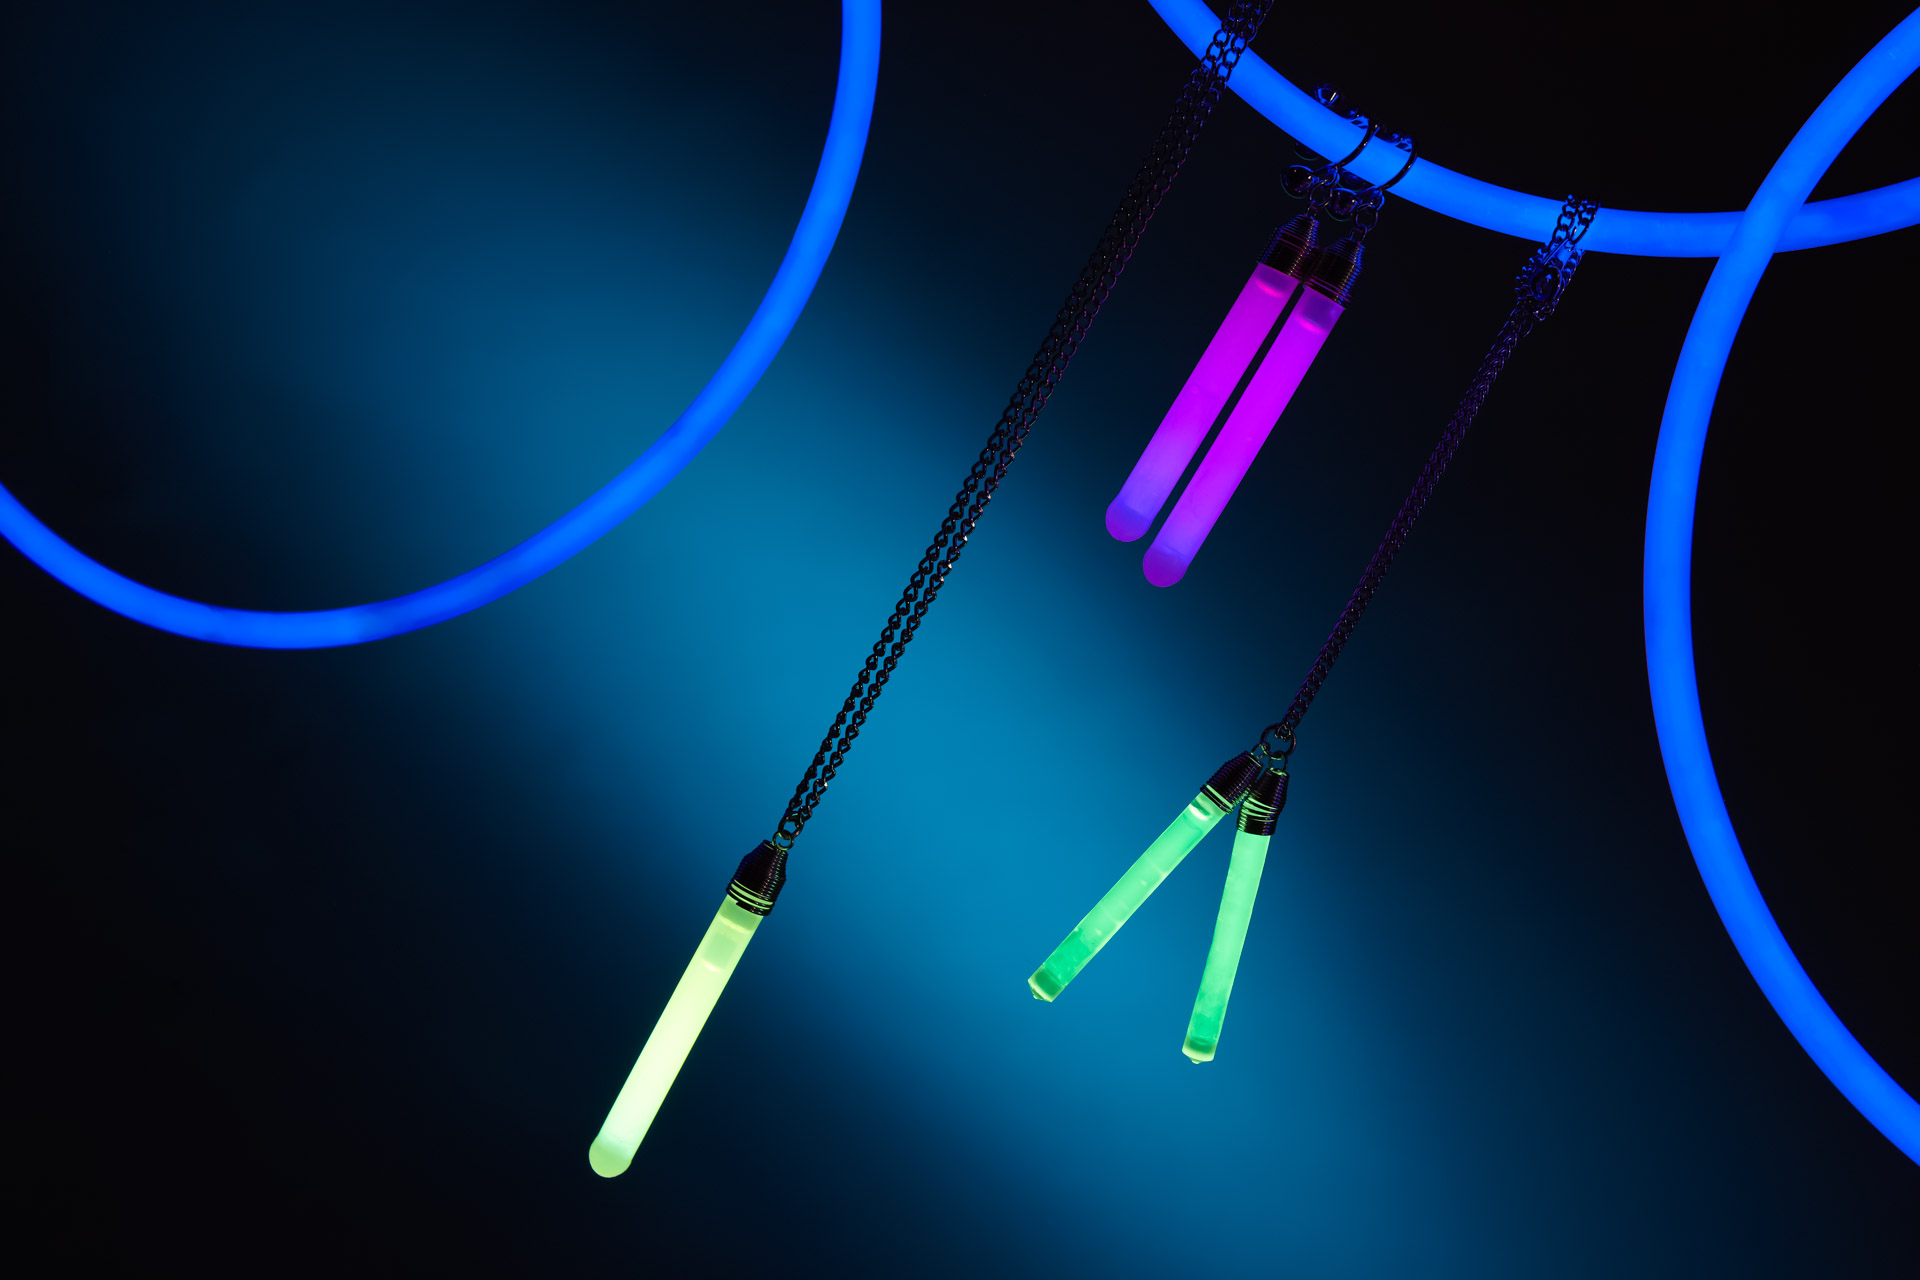 Product foto van assortiment glow sticks